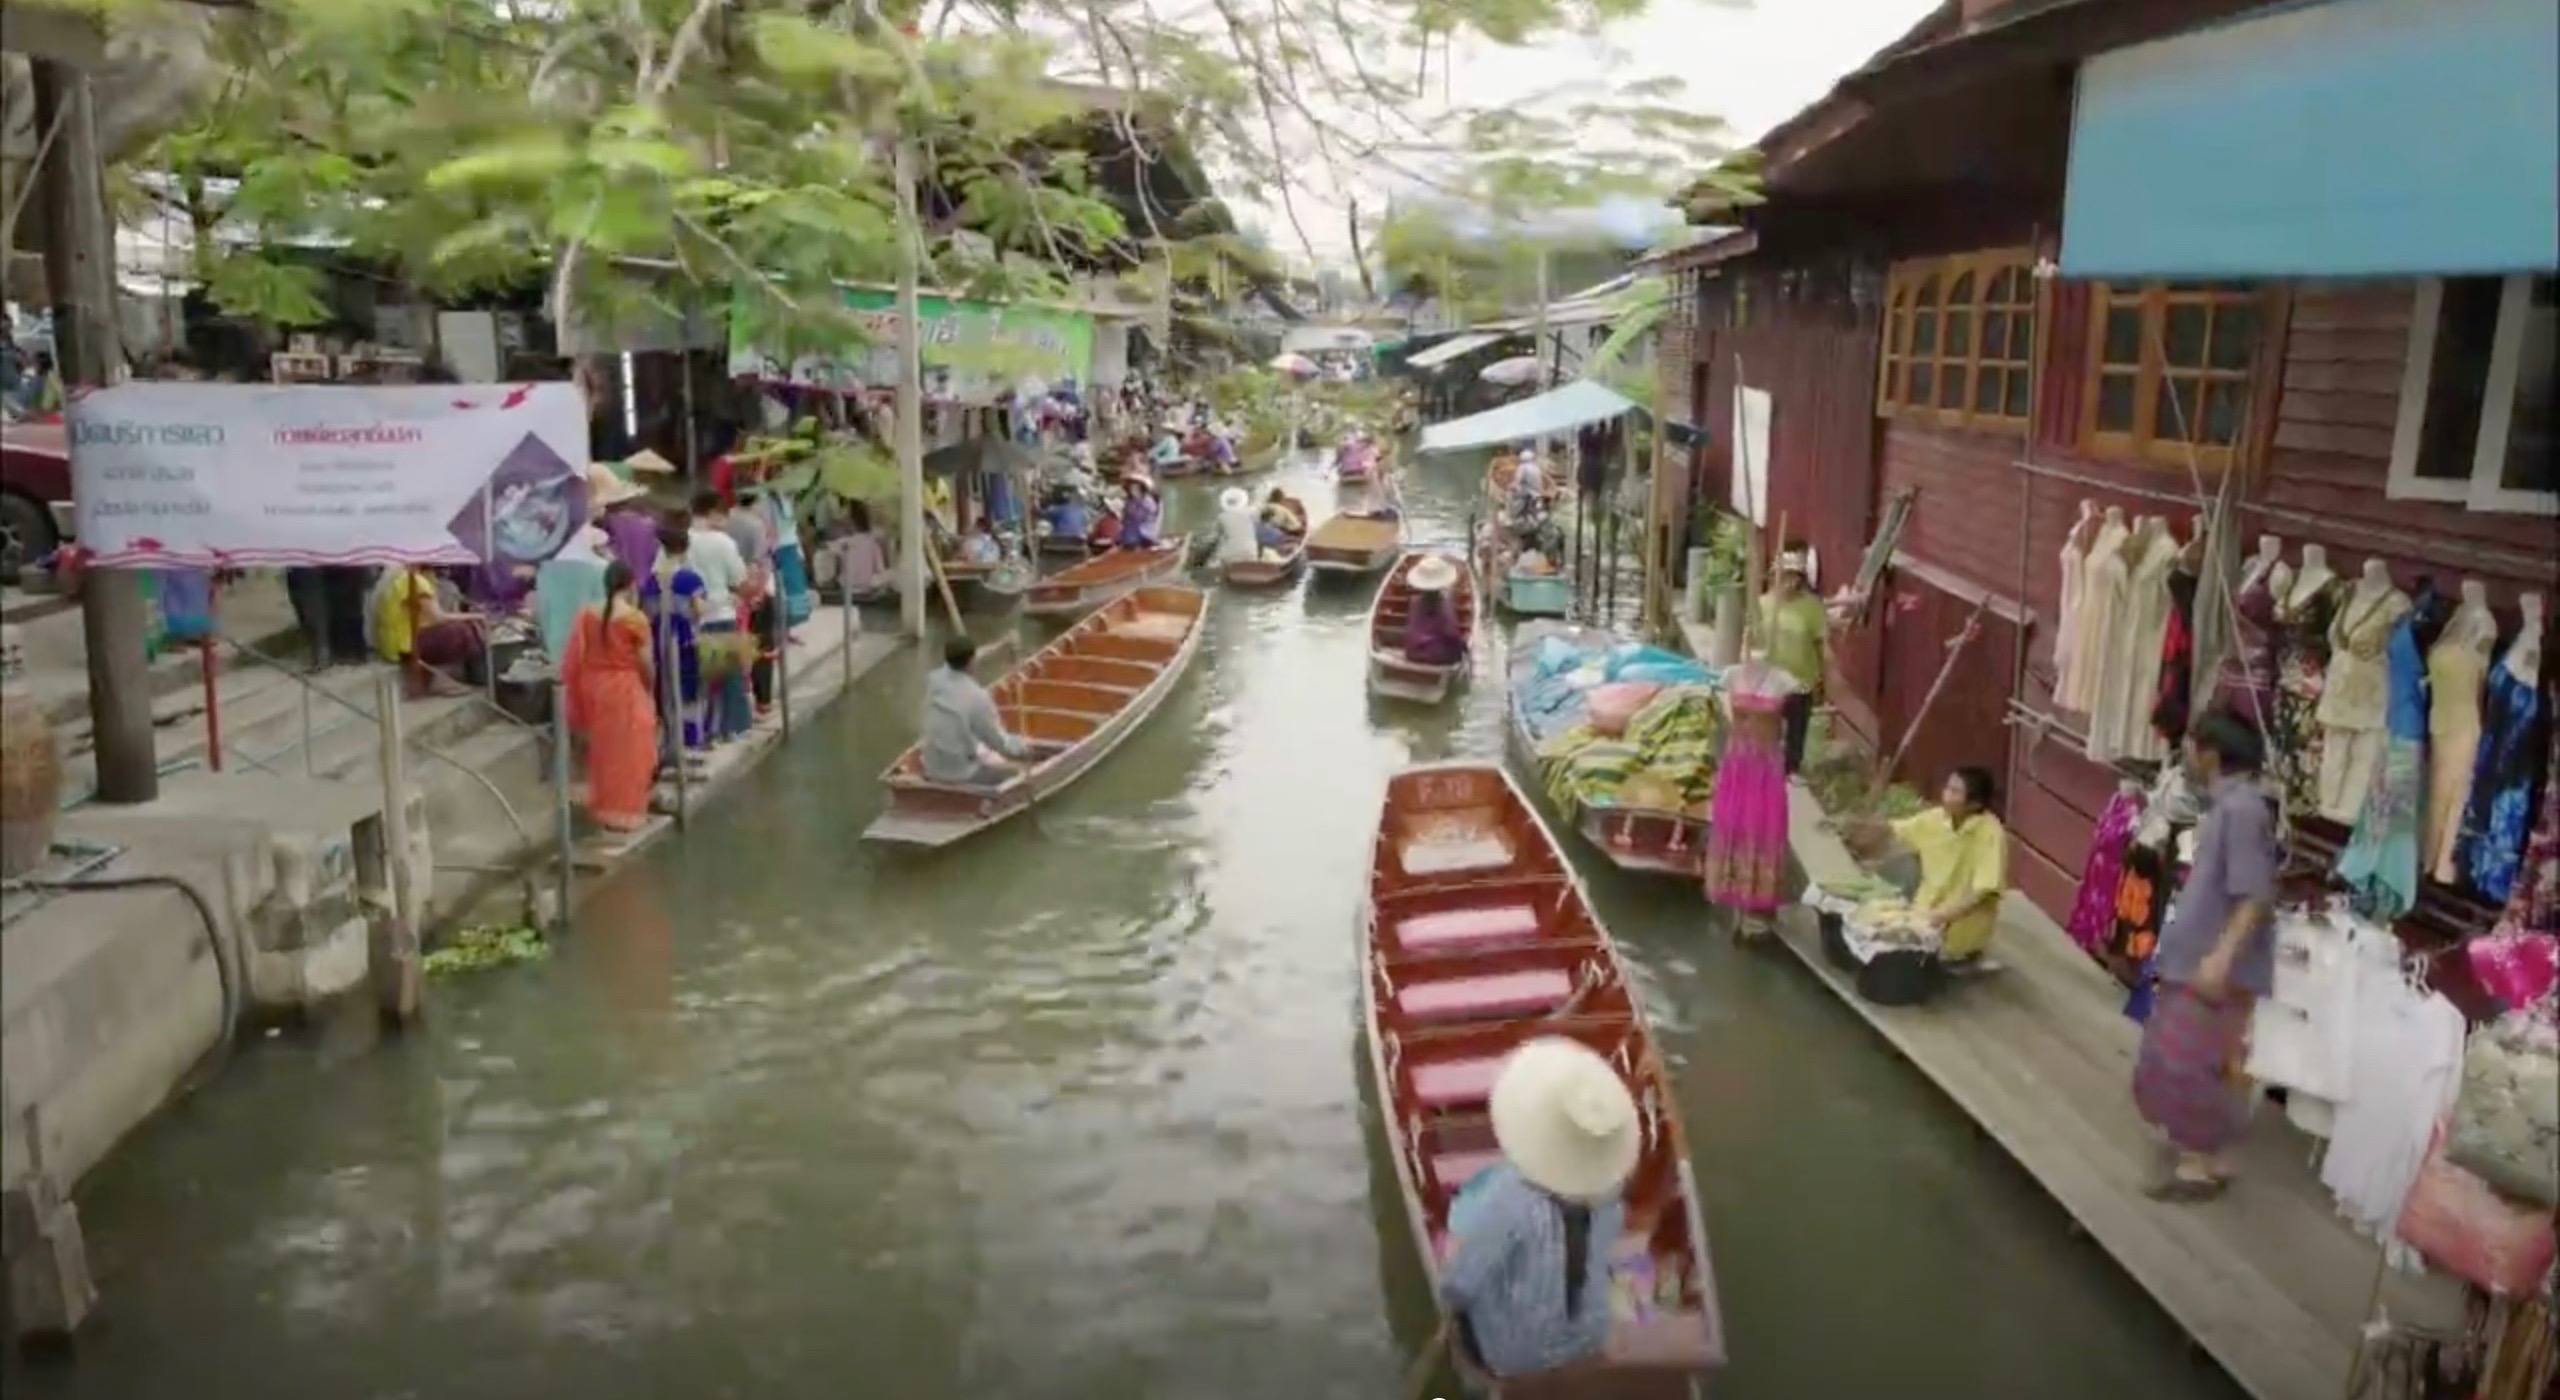 Damoen Saduak Floating Market [ตลาดน้ำดำเนินสะดวก] – Korean Dramaland